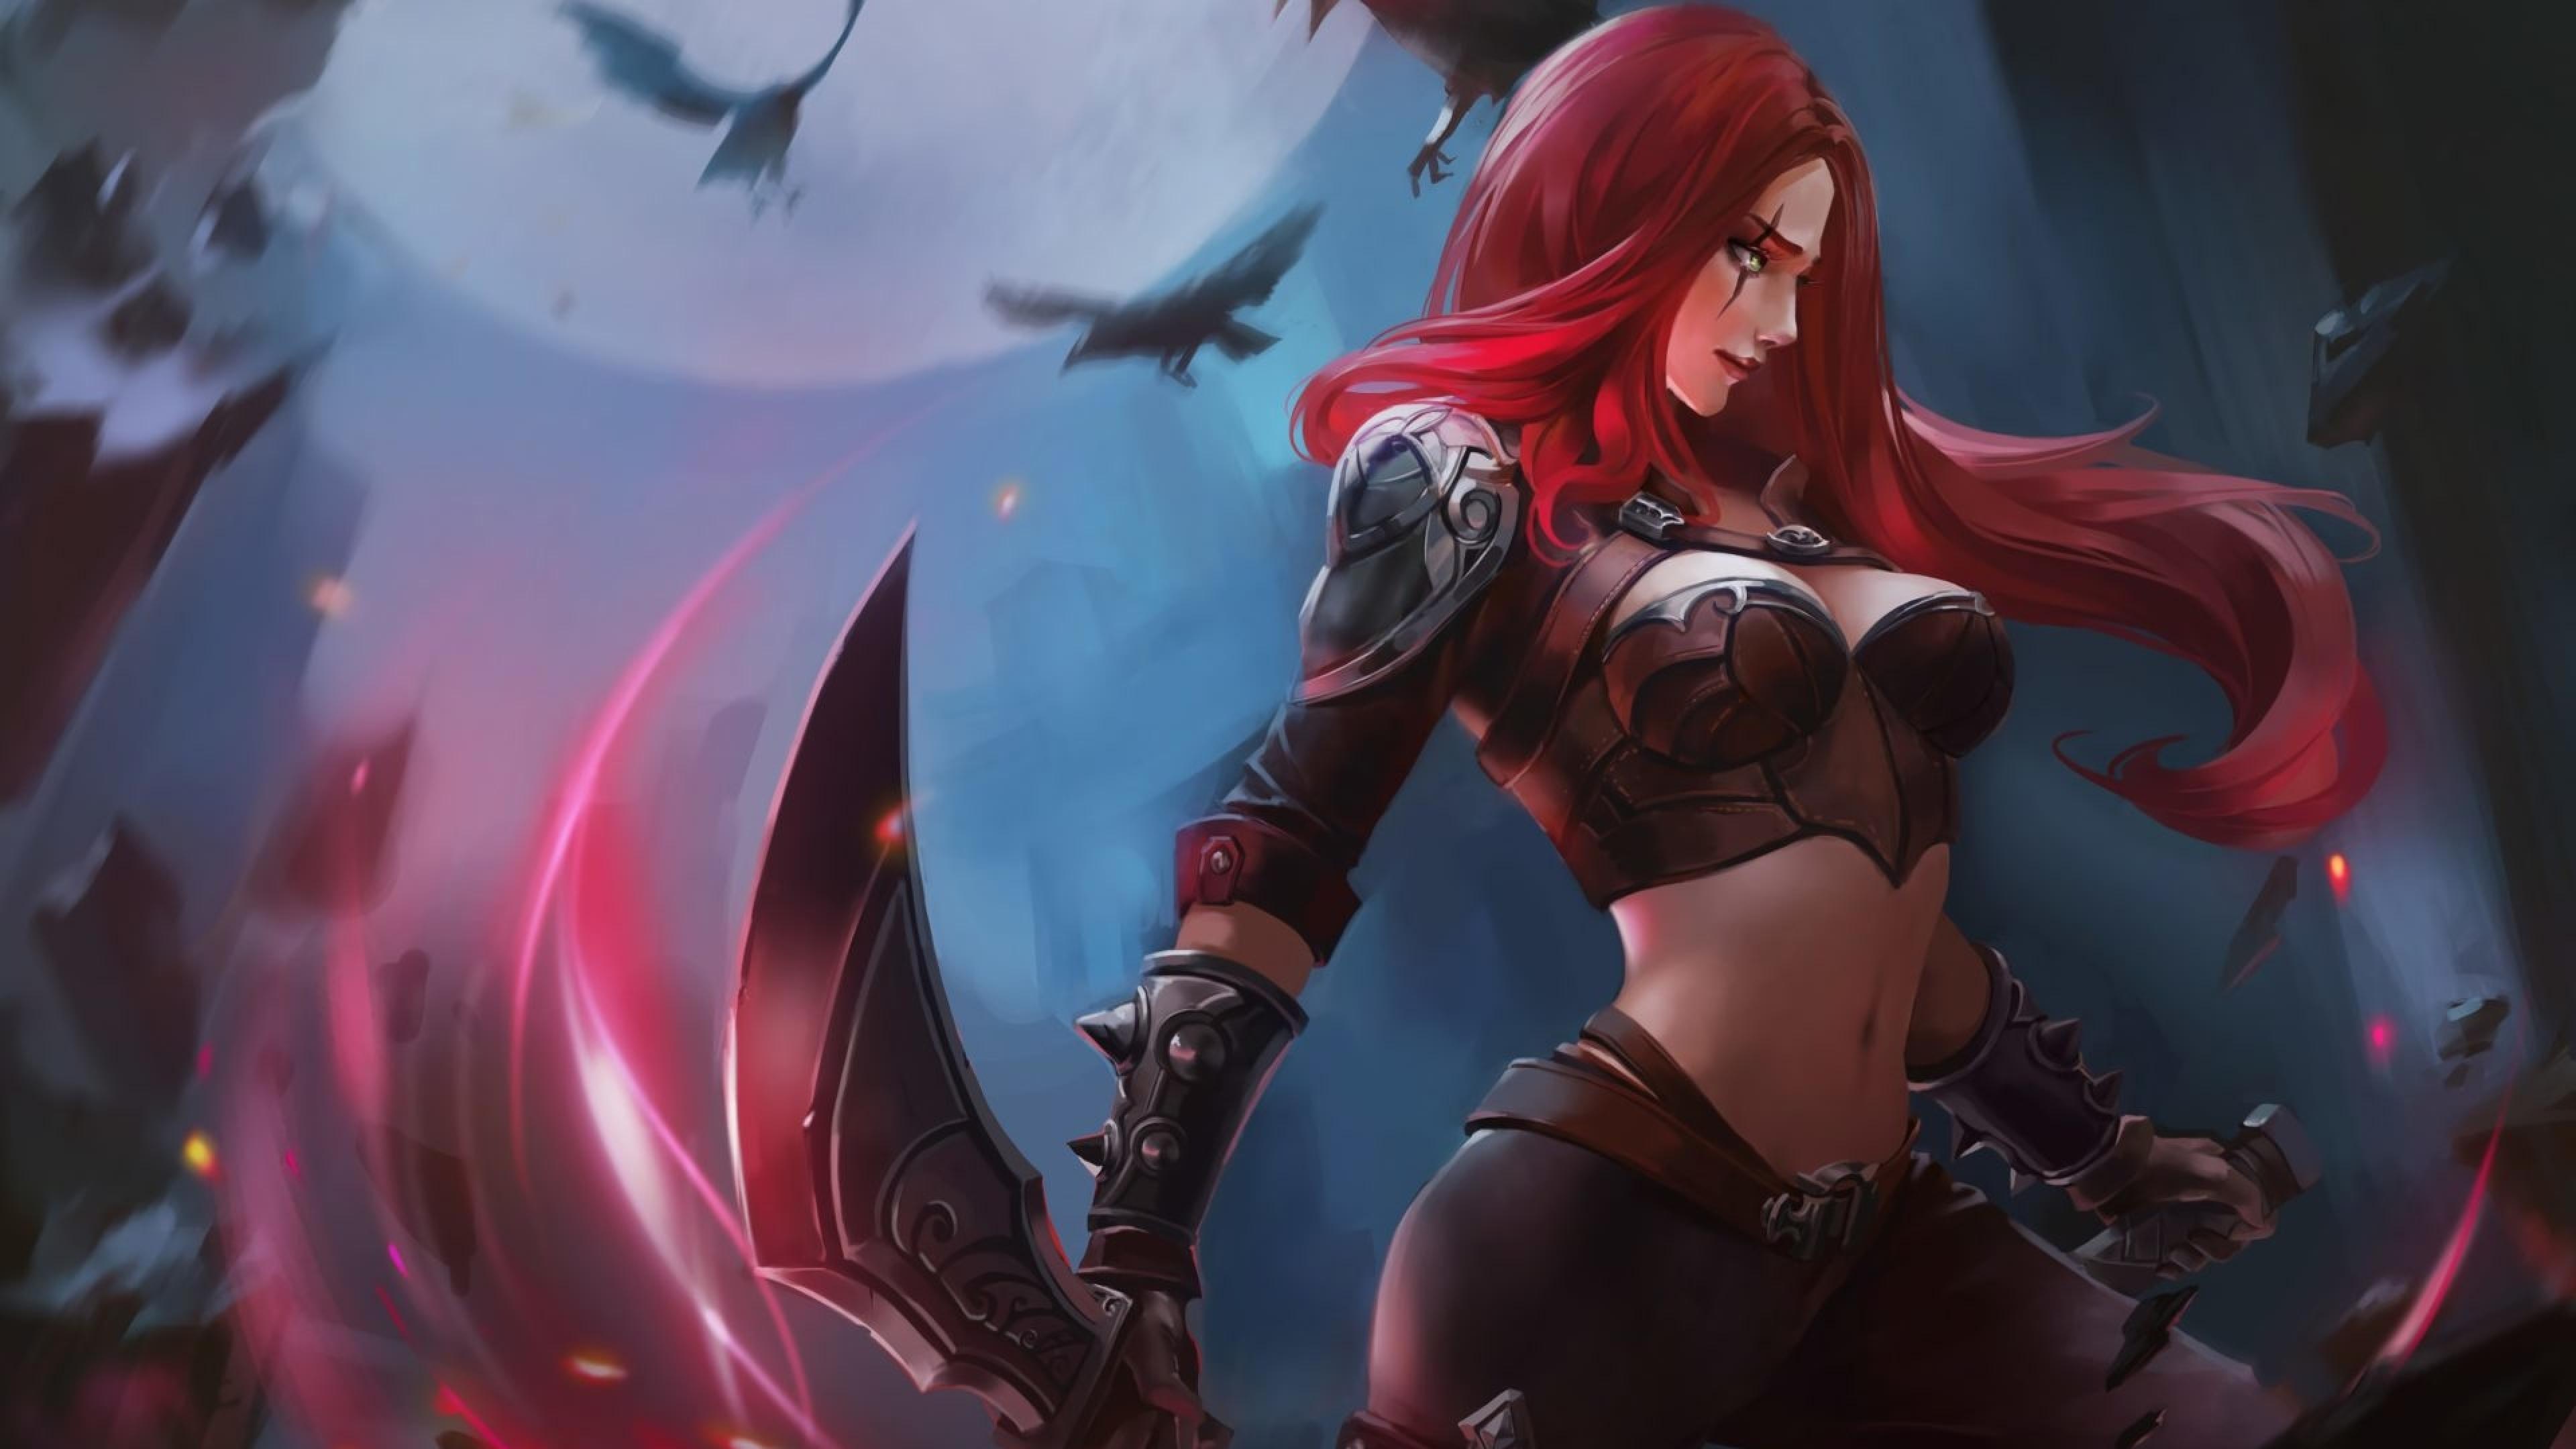 3840x2160 Katarina In League Of Legends 4k Wallpaper Hd Games 4k